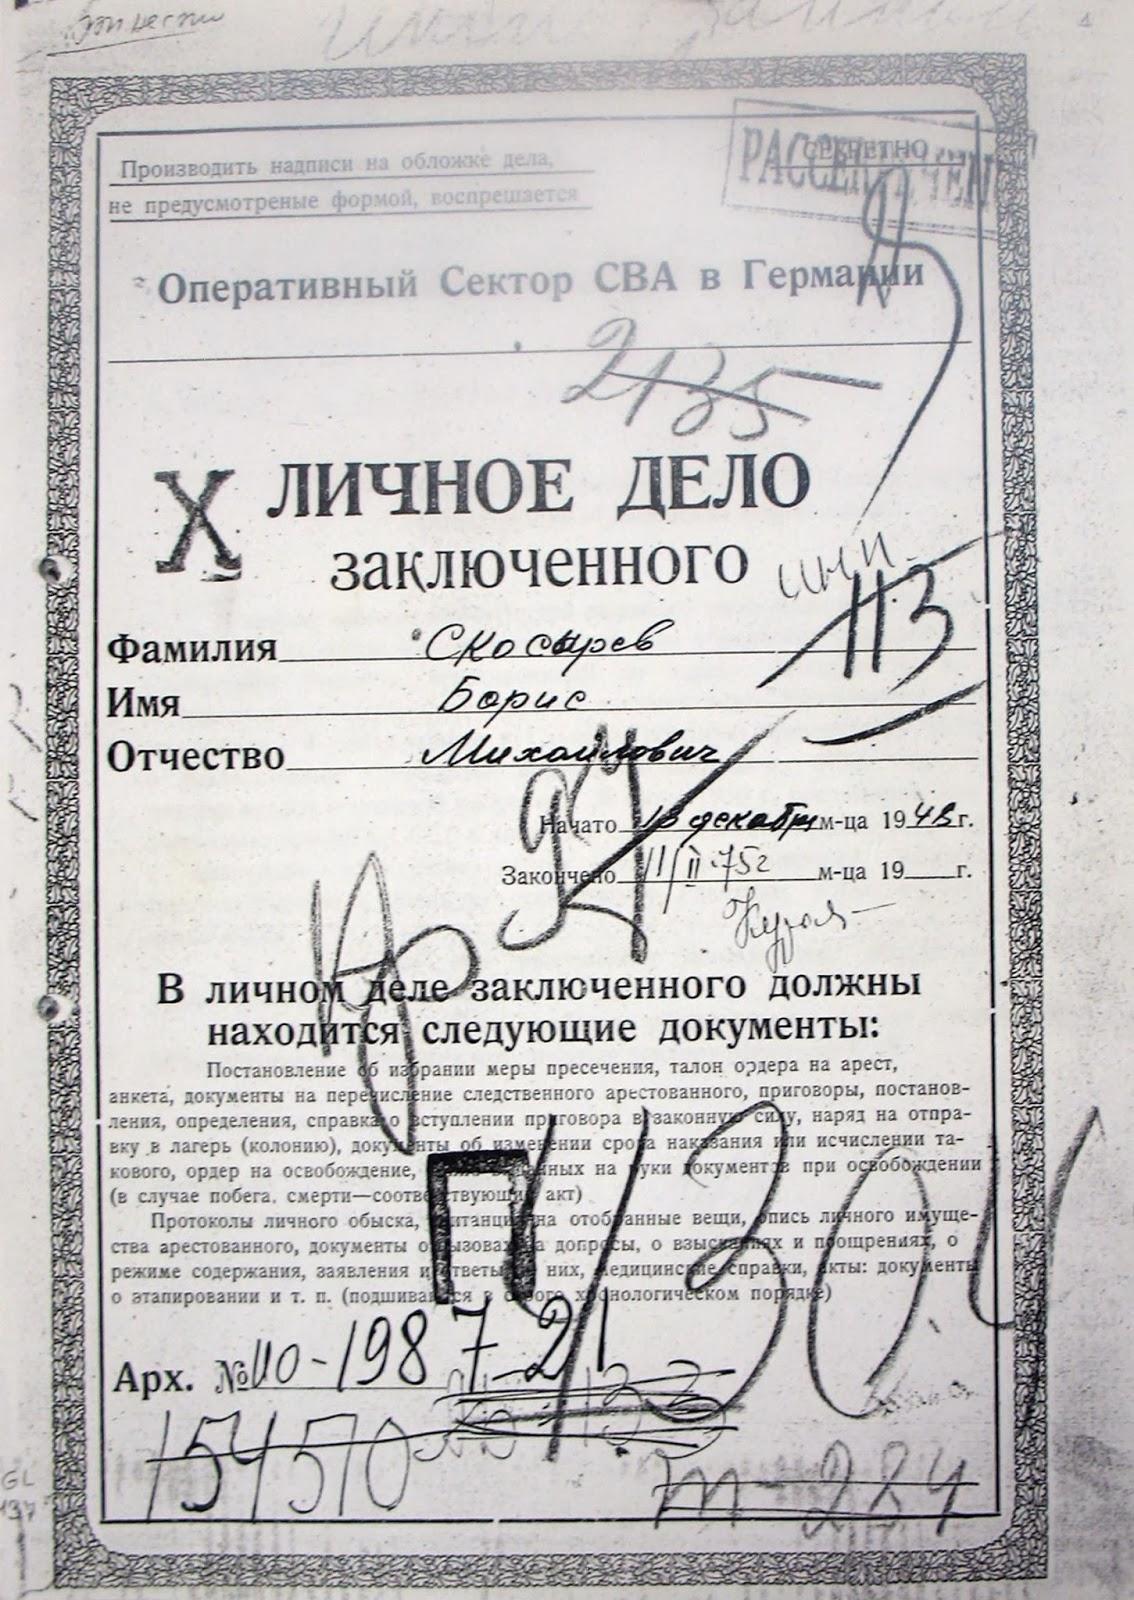 http://4.bp.blogspot.com/-5MYP3UDq1fY/Uu-NgJpnHDI/AAAAAAAAAZ8/AUd-d_HOxsg/s1600/dossier+boris+poli+sovietica.jpg